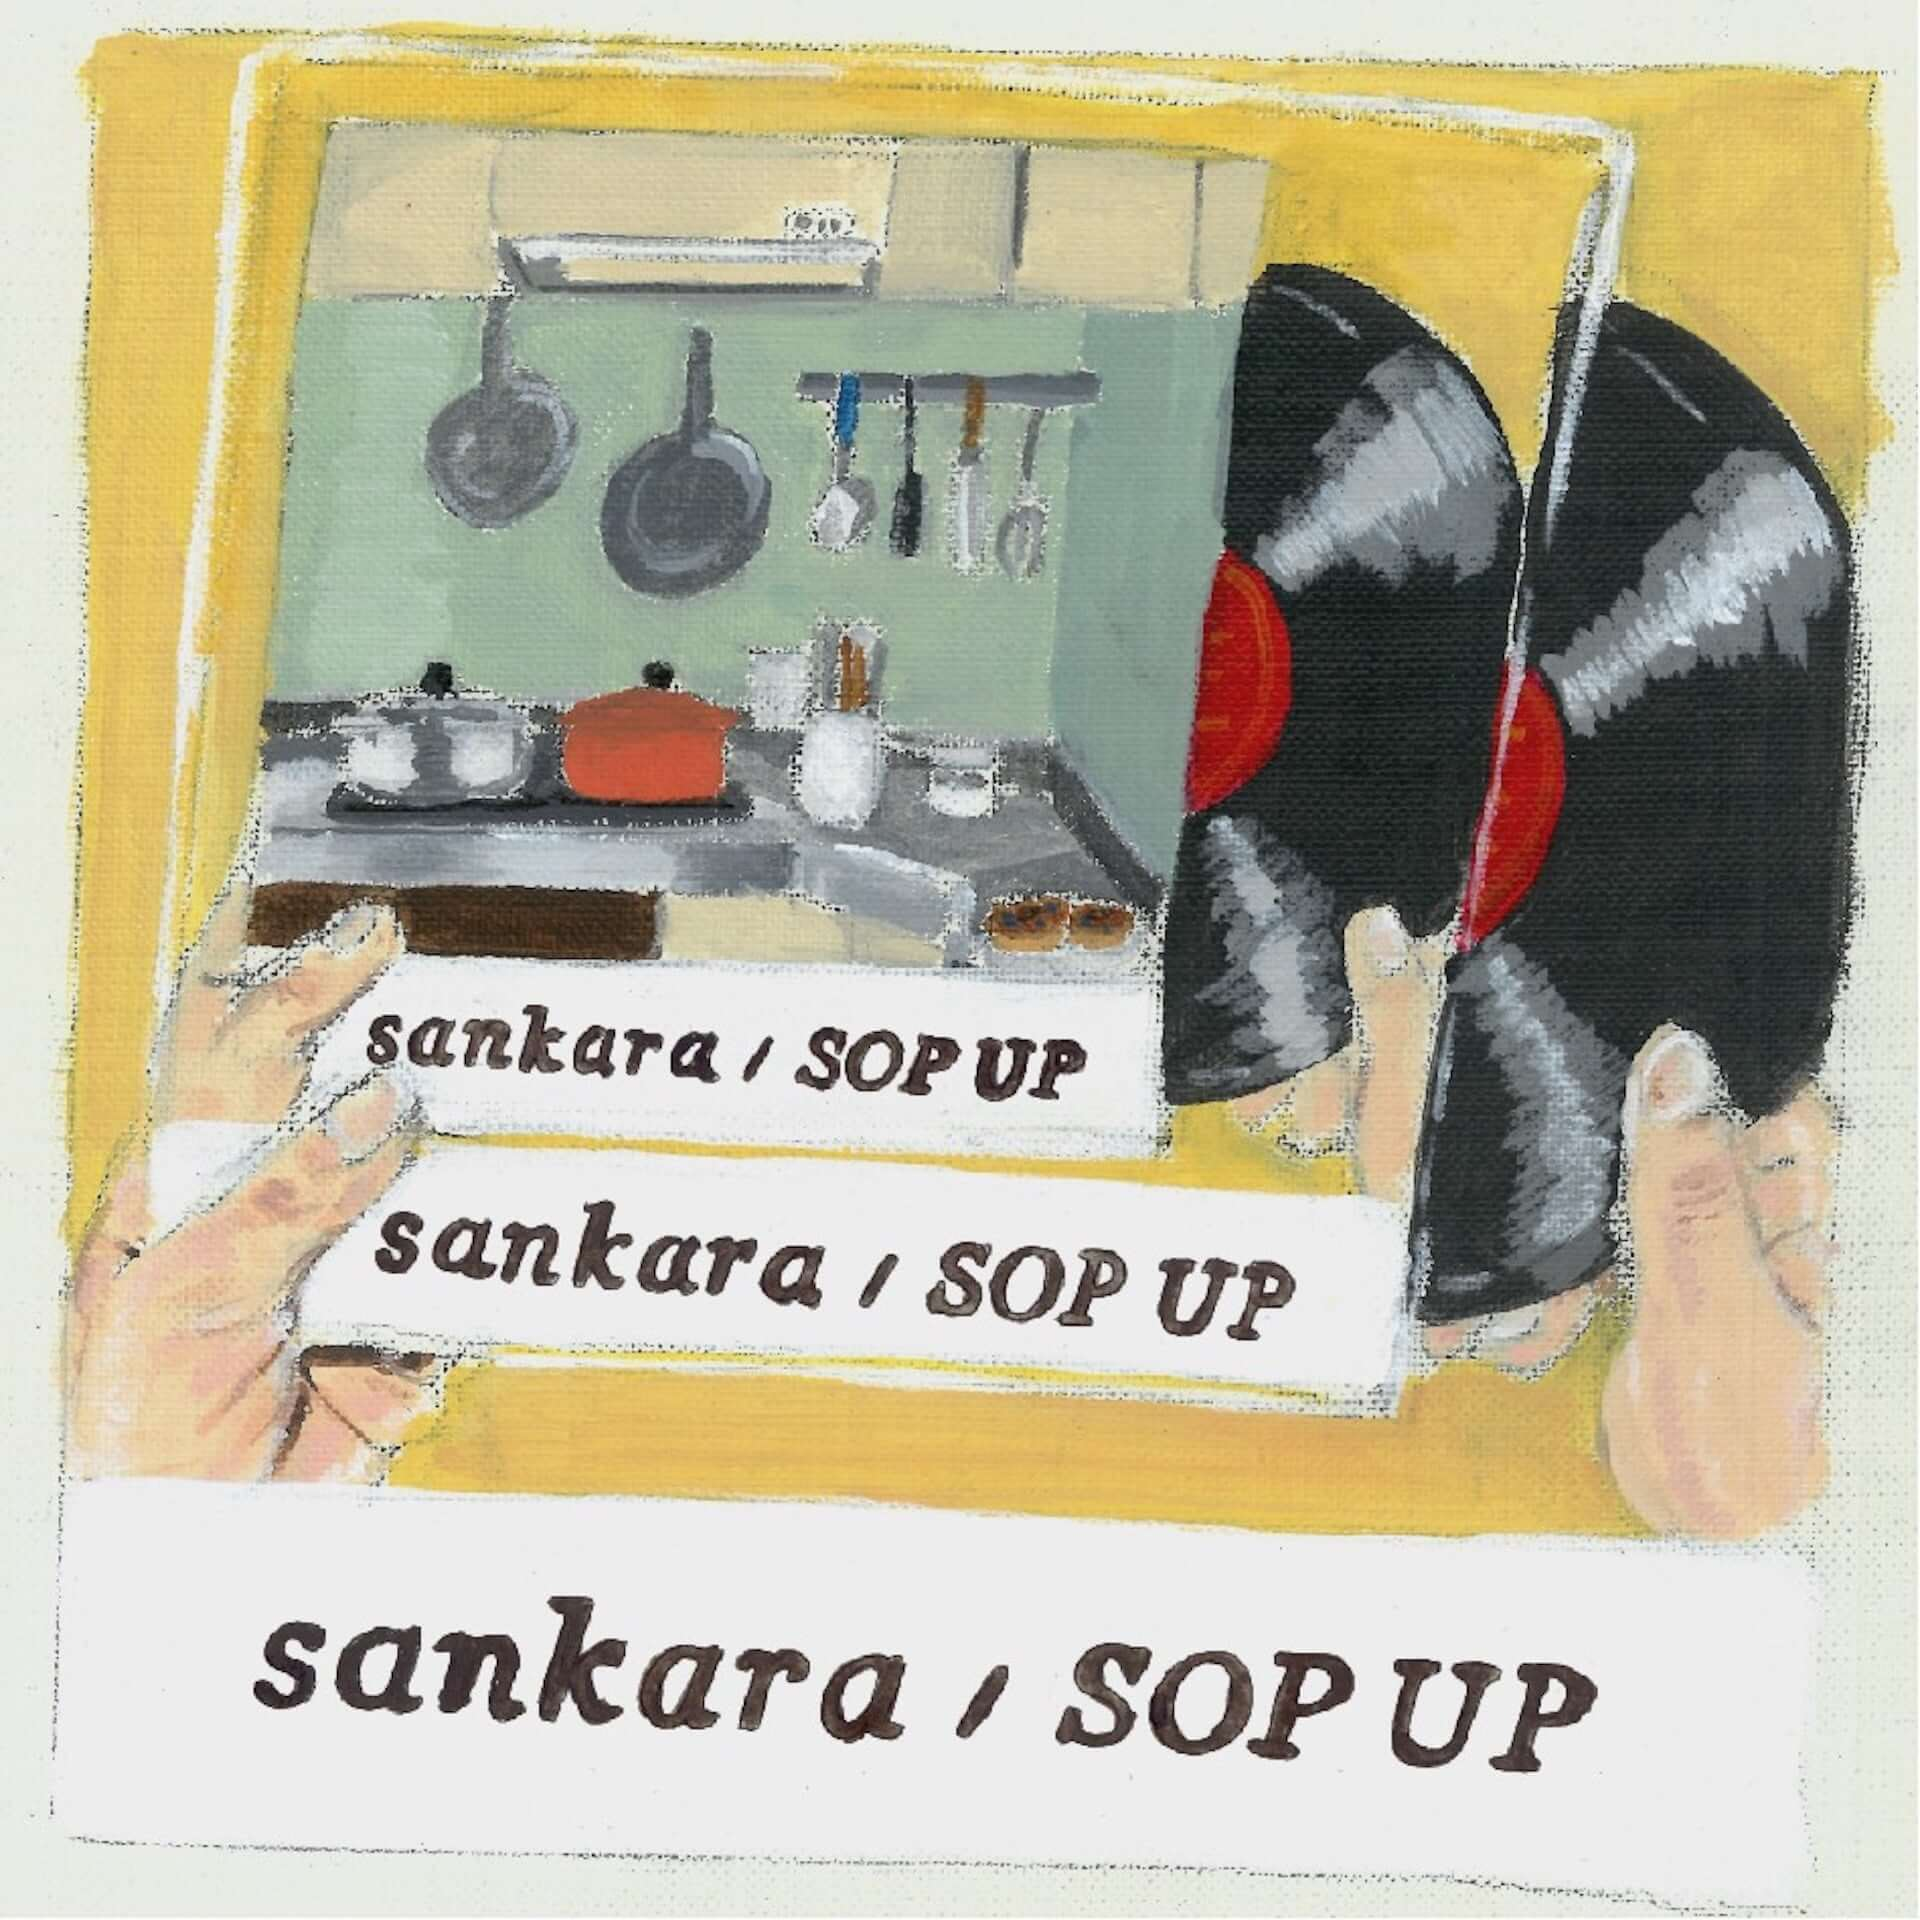 sankara、3月にセカンドEP『SOP UP』リリース決定|WALL & WALLにて発売記念ワンマンライブを開催 music200131_sankara_main-1920x1920